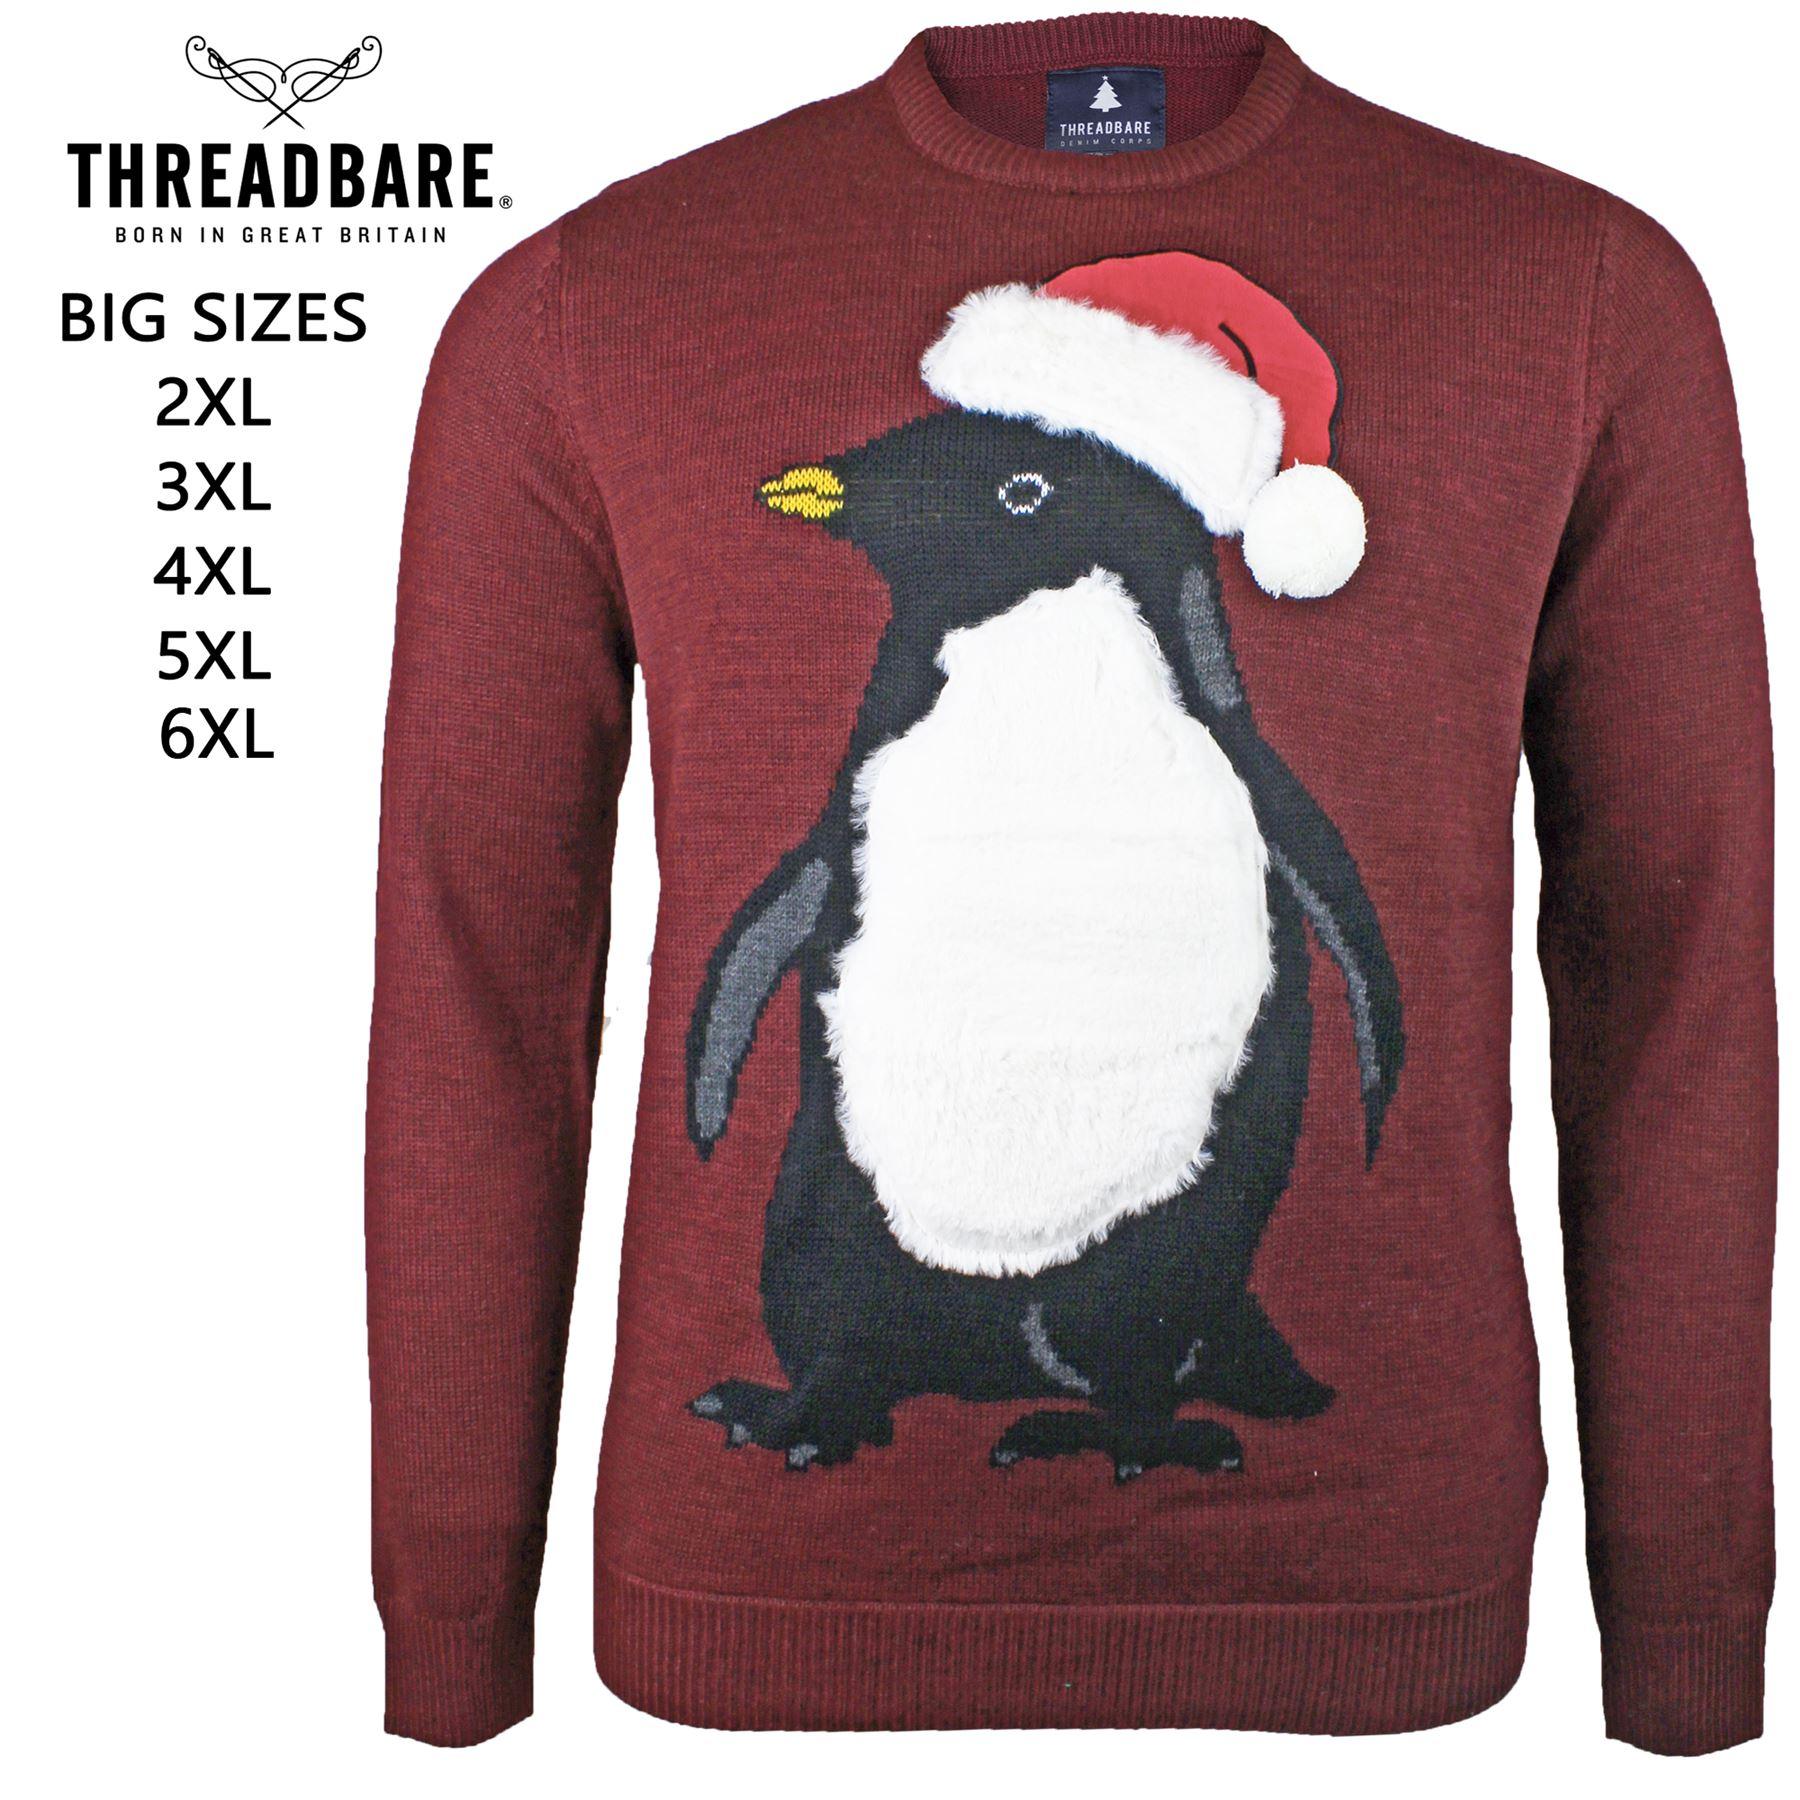 Mens New Xmas Christmas Sweatshirt Sweater Knit Penguin Print Crew Neck